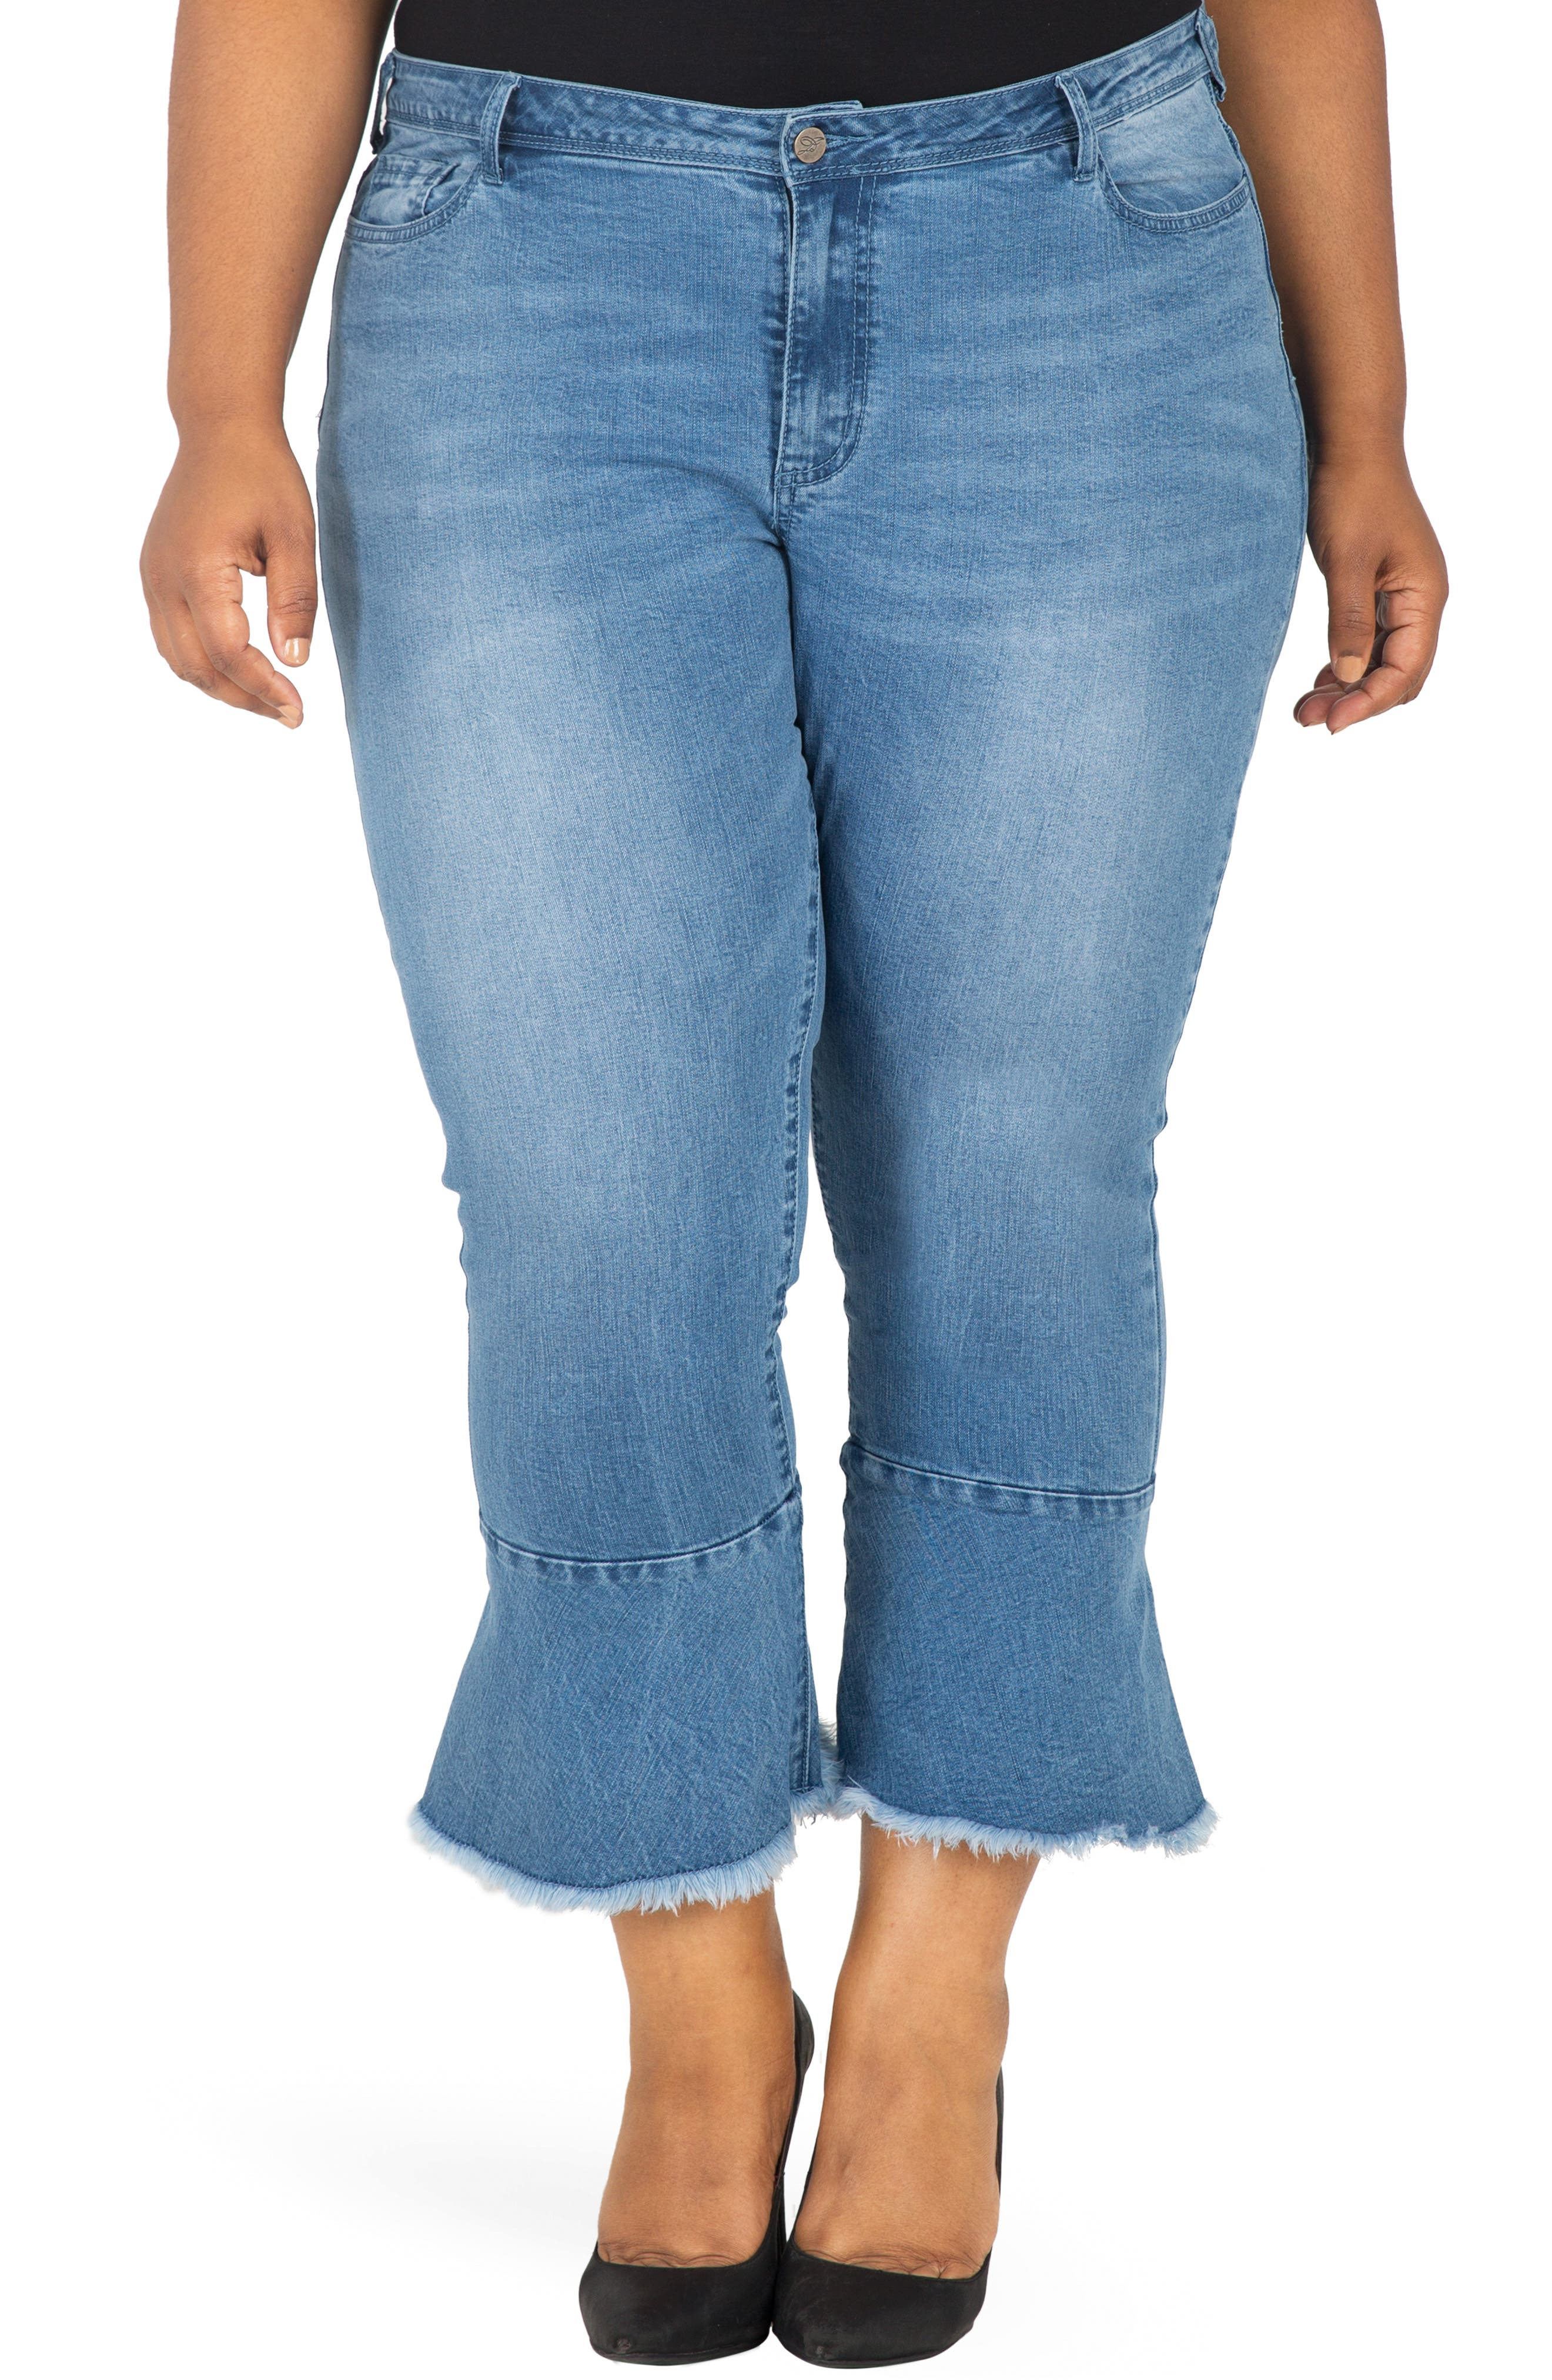 POETIC JUSTICE, Kesha Ruffle Skinny Jeans, Main thumbnail 1, color, BLUE